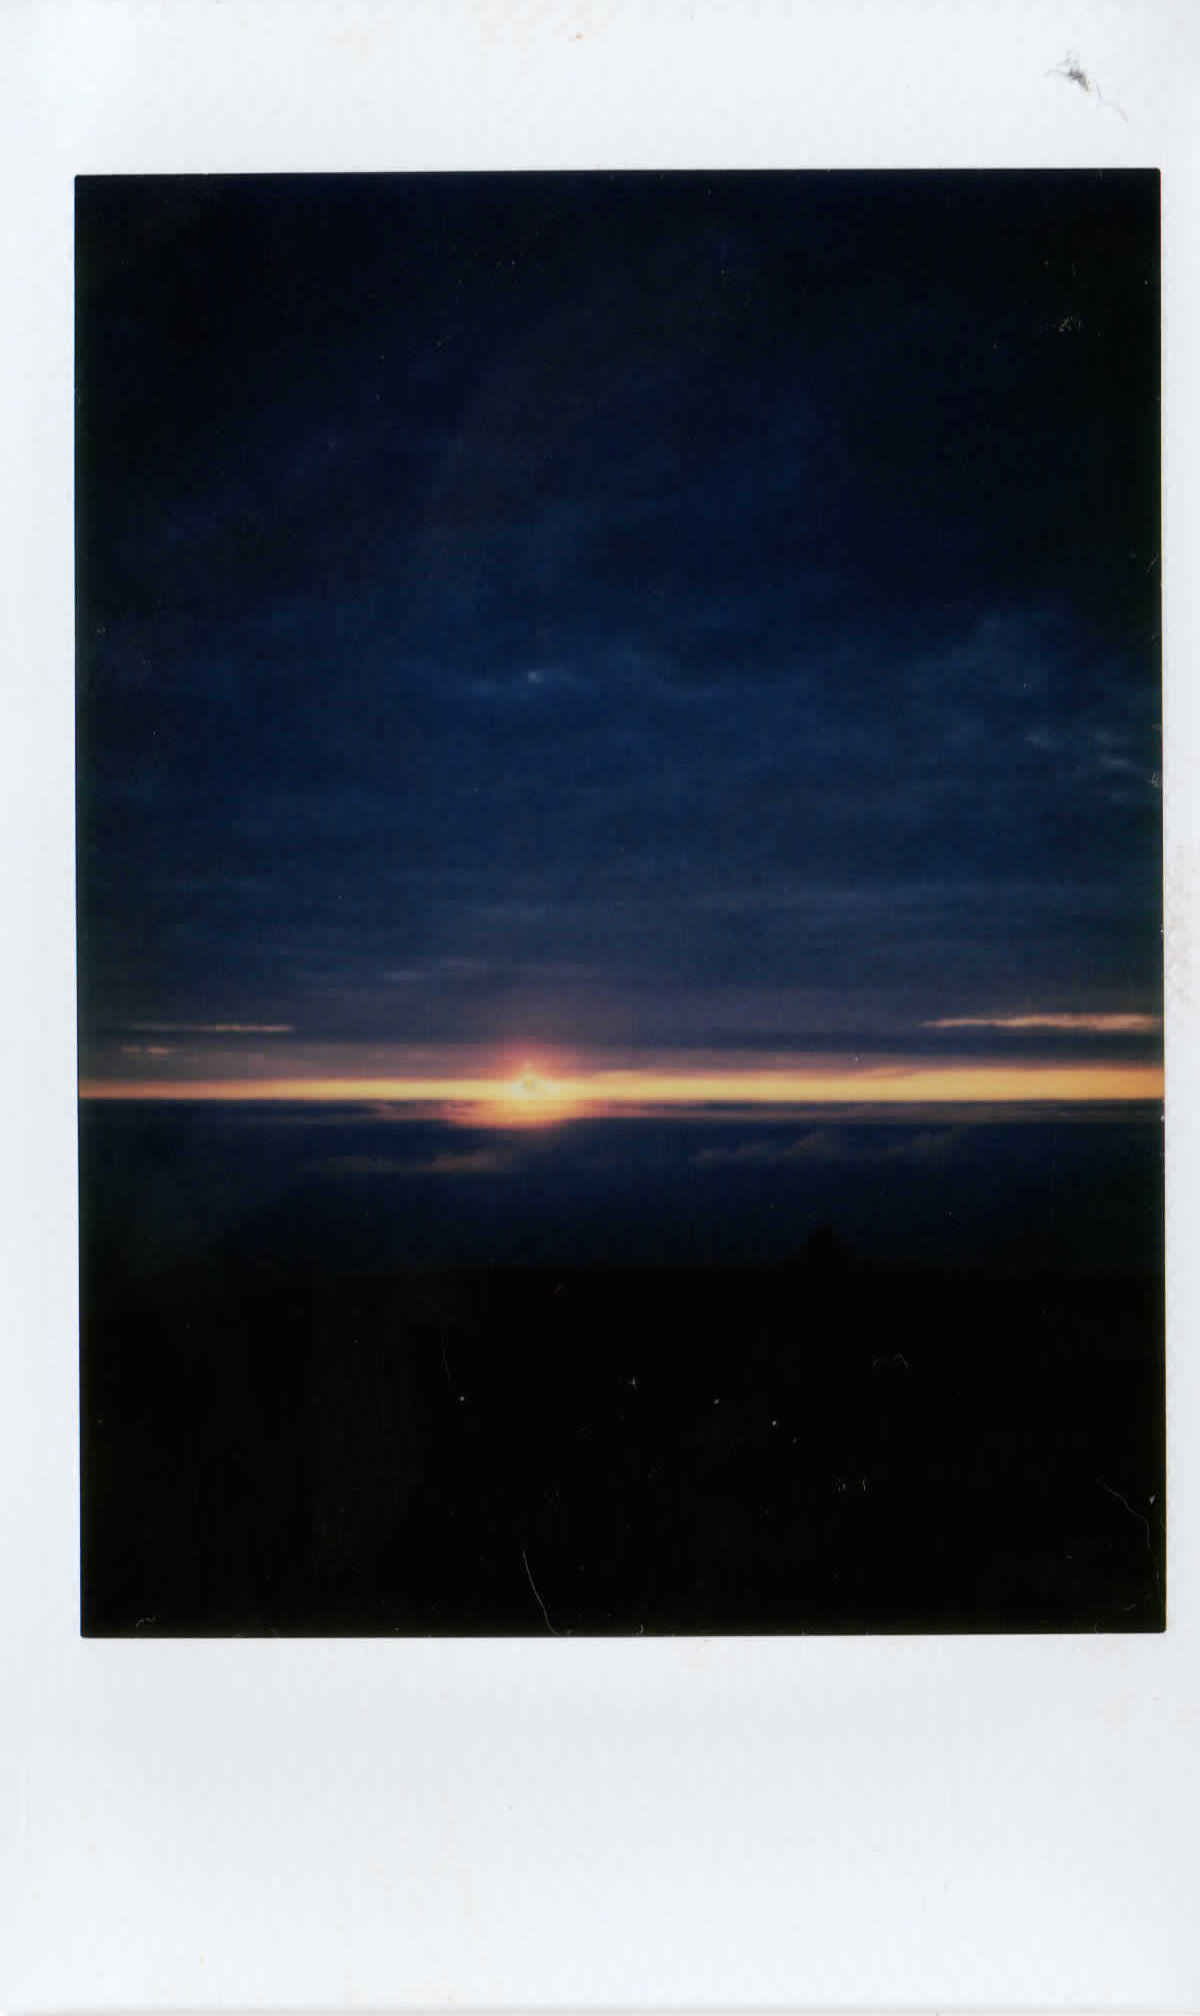 sunriseovercadillac.jpg